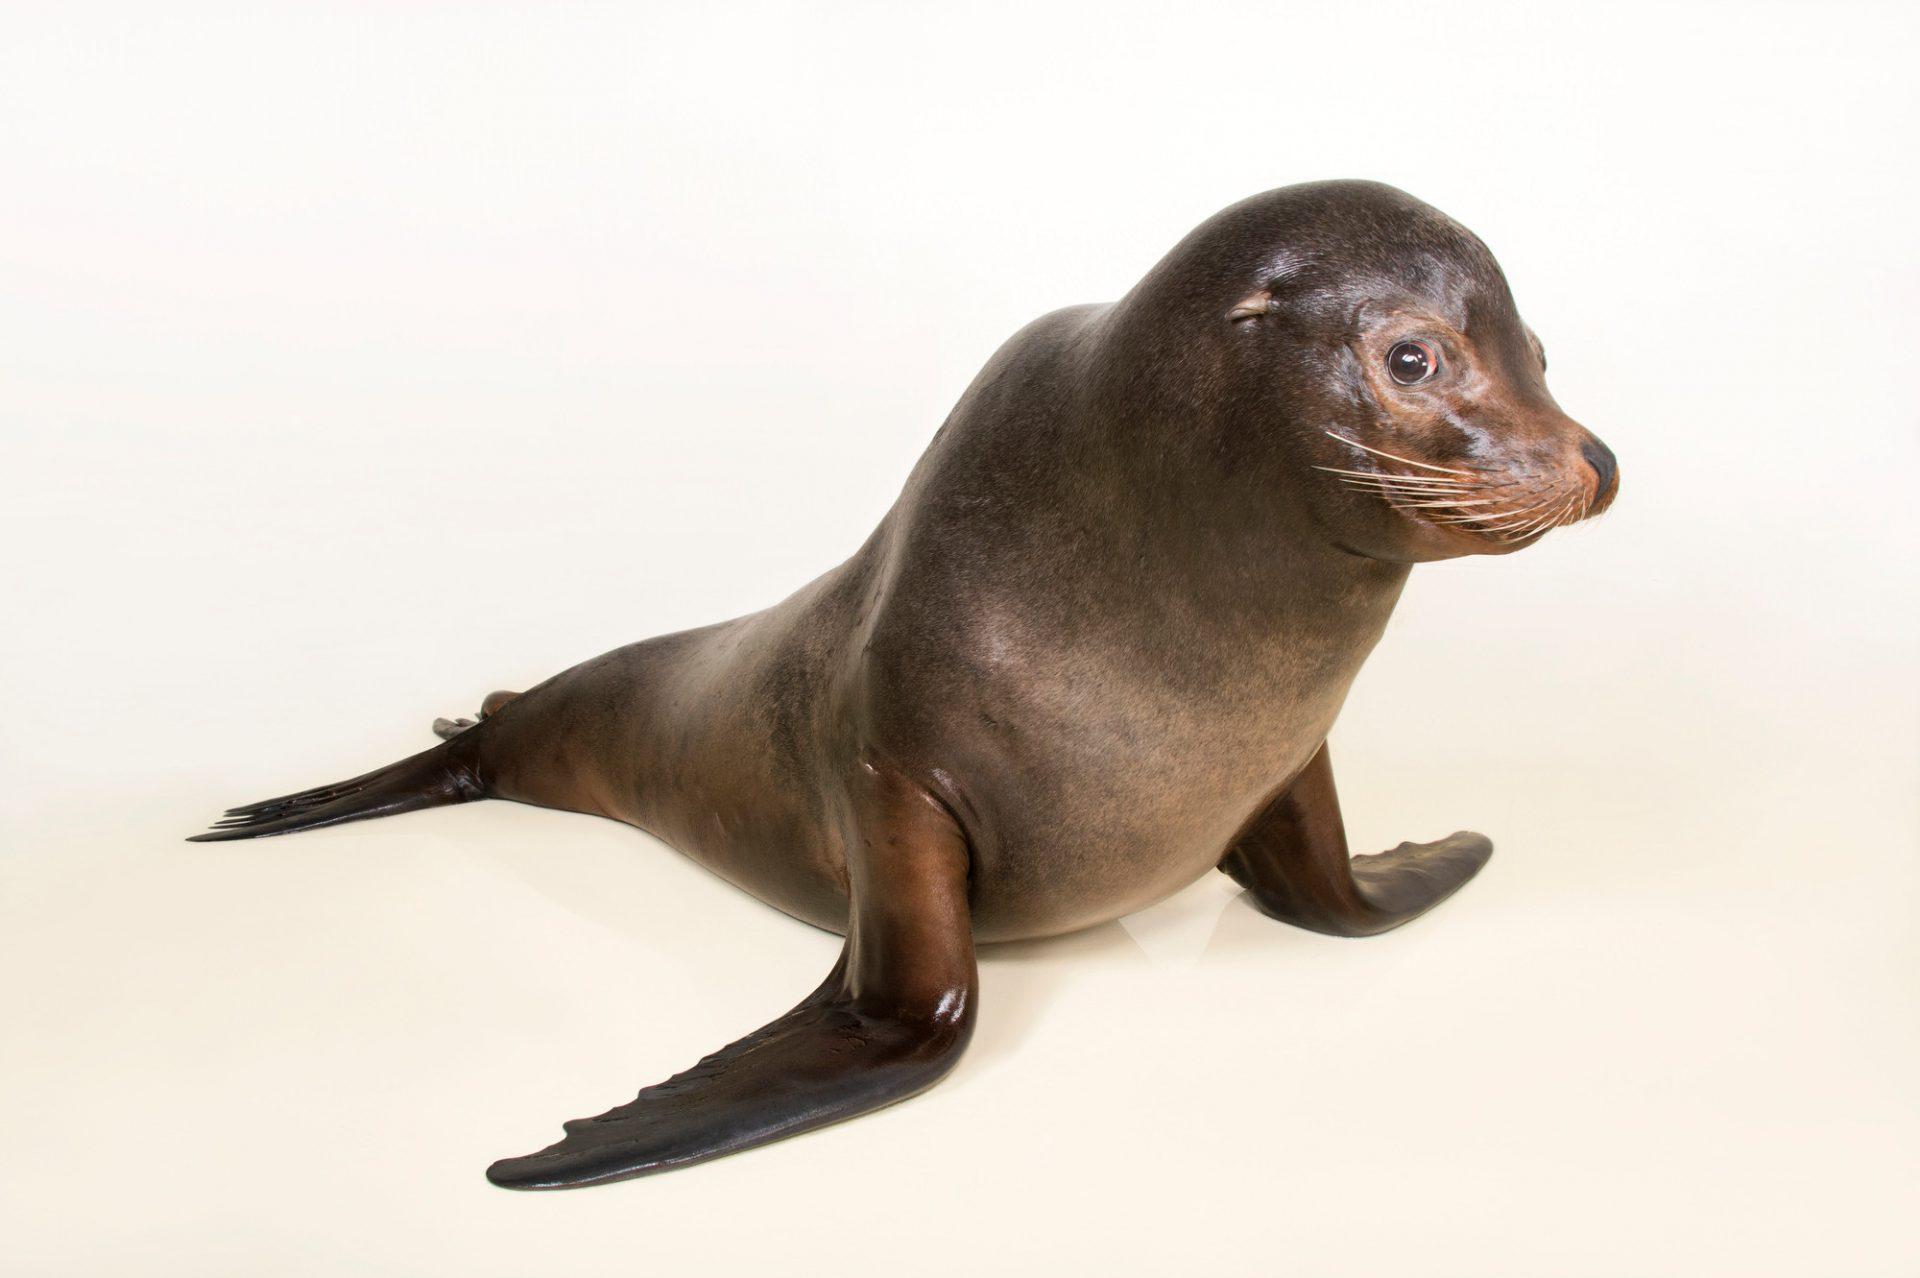 A California sea lion, Zalophus californianus.